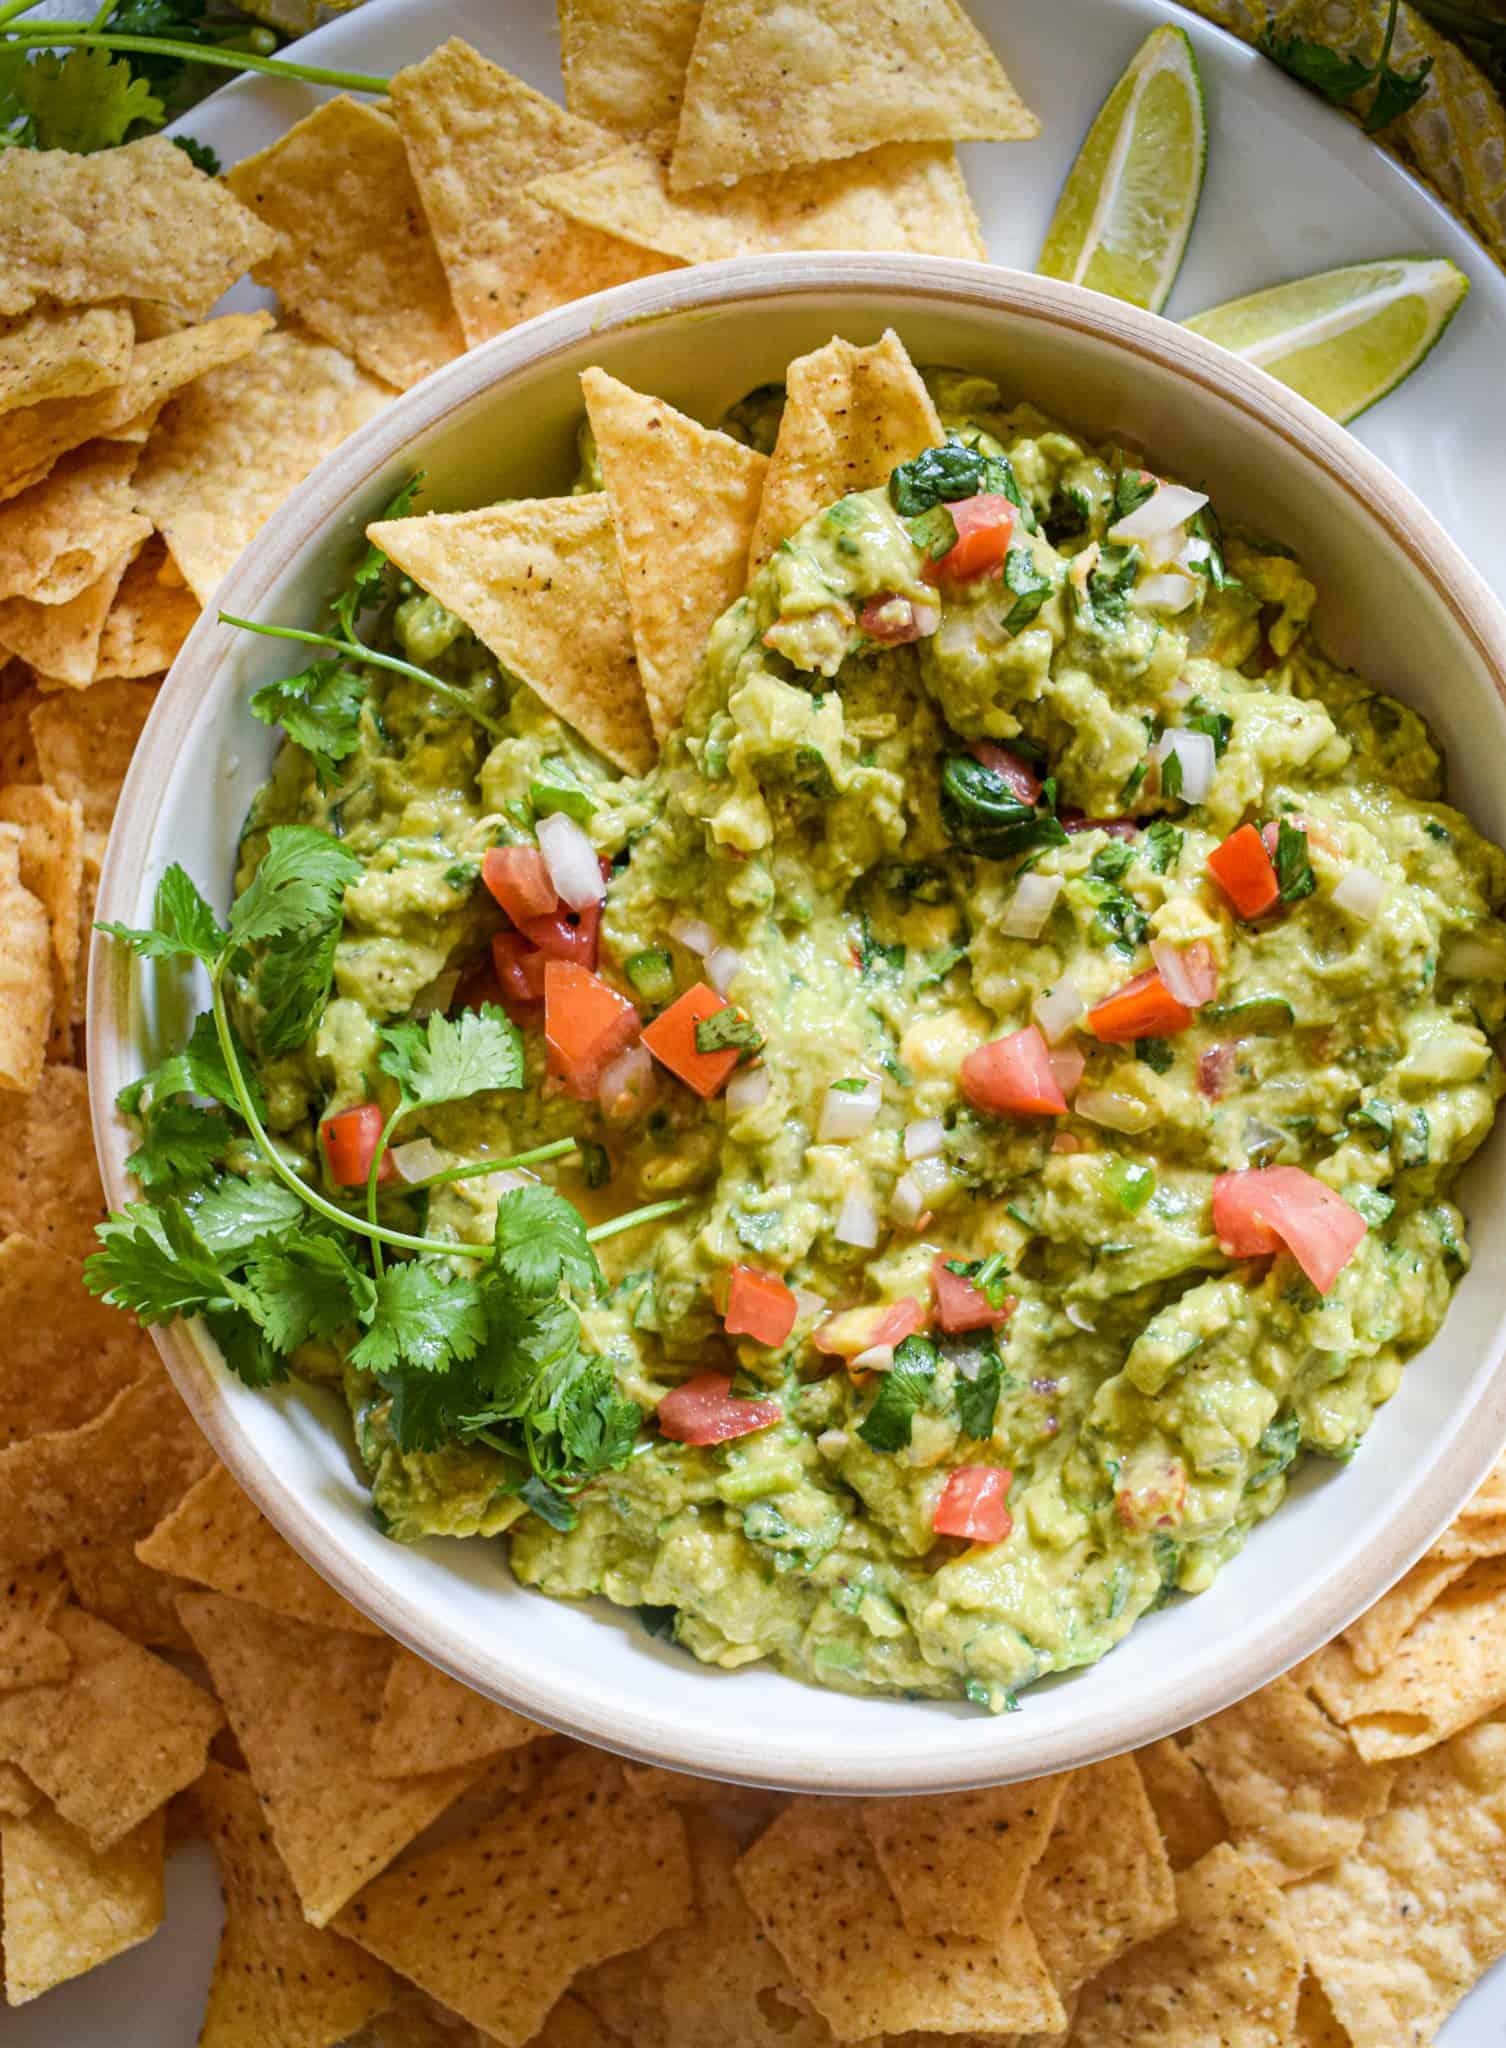 best simple homemade guacamole recipe texas style